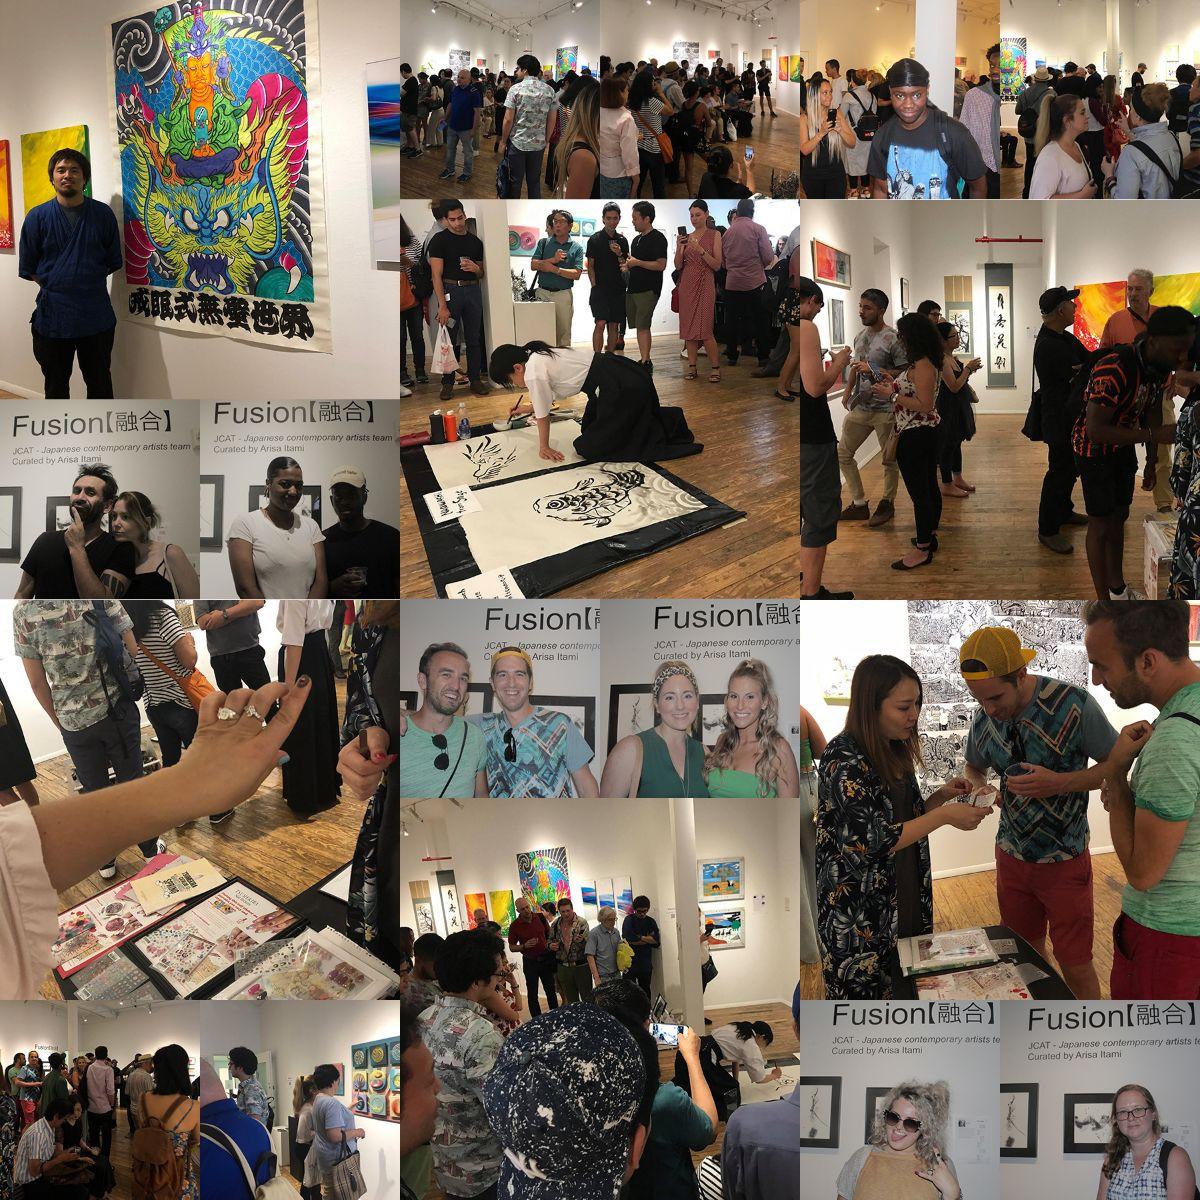 08/19/2019 - 【JCATサプリ- JCAT Exhibition Diary】JCAT Exhibition ダイアリー Vol.2